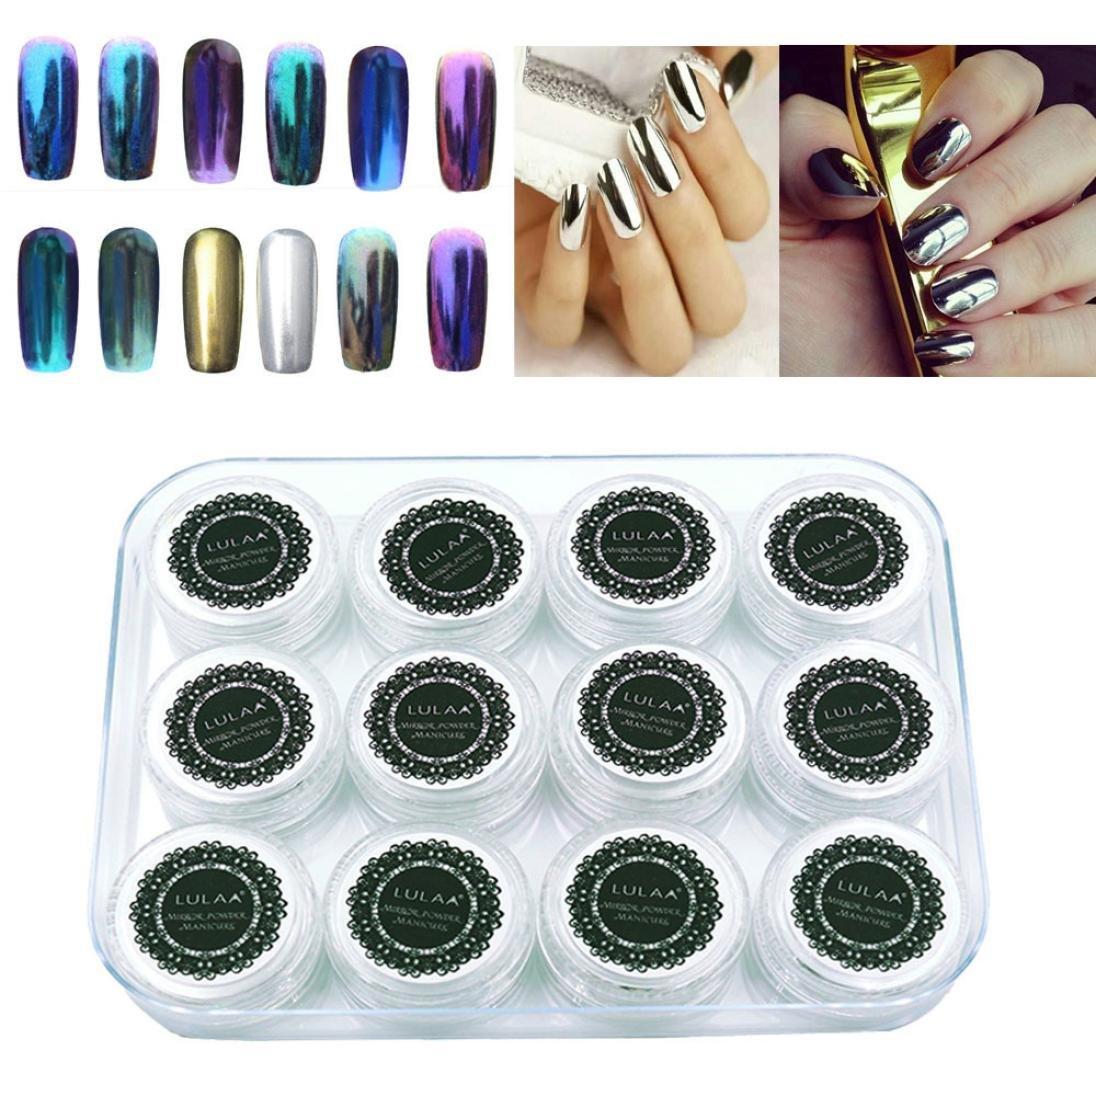 Amazon.com : LULAA 12 Colors Nail Glitter Powder Shinning Nail ...